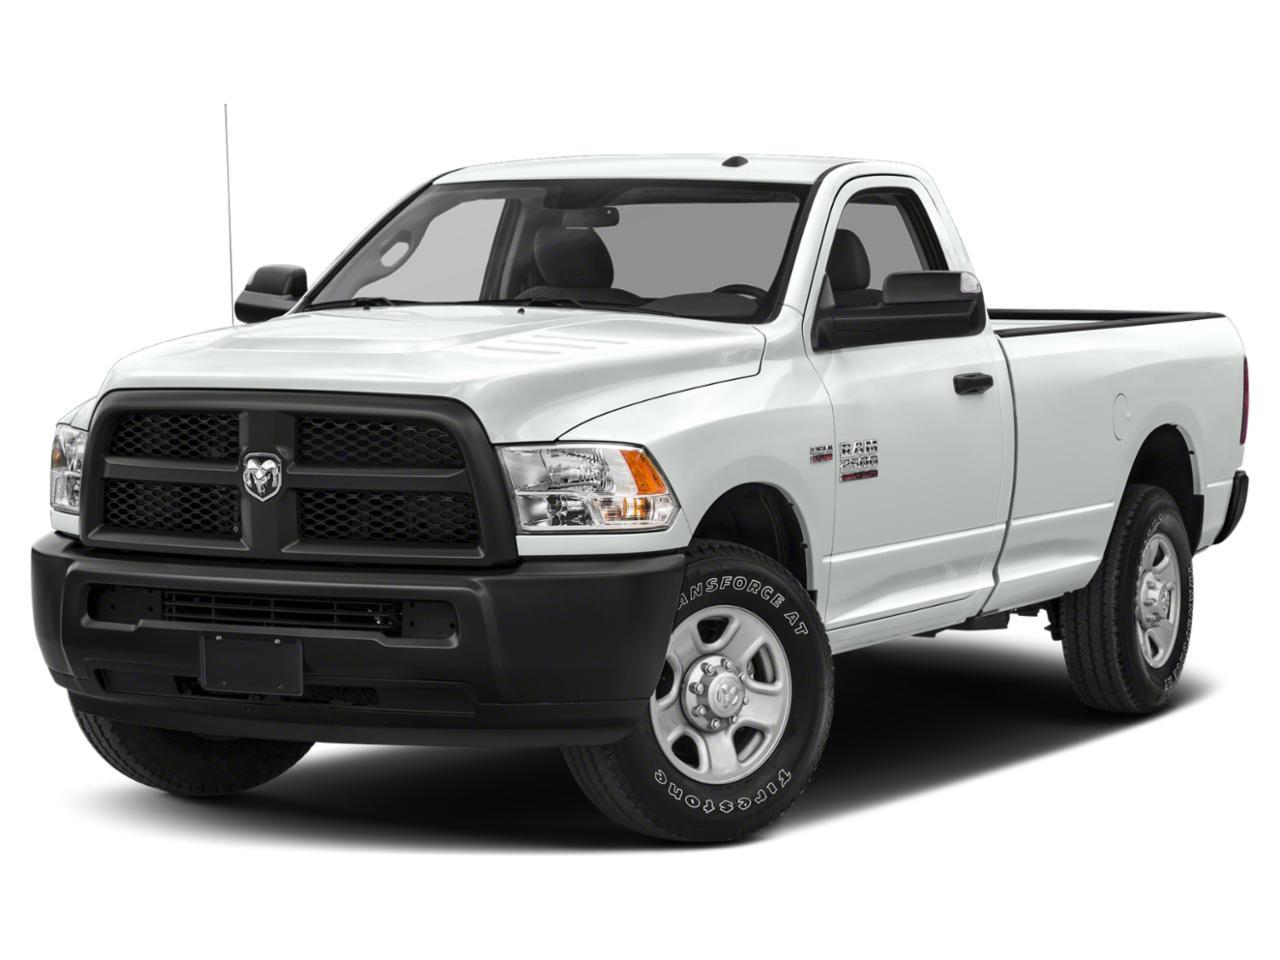 2018 Ram 2500 Vehicle Photo in Jasper, GA 30143